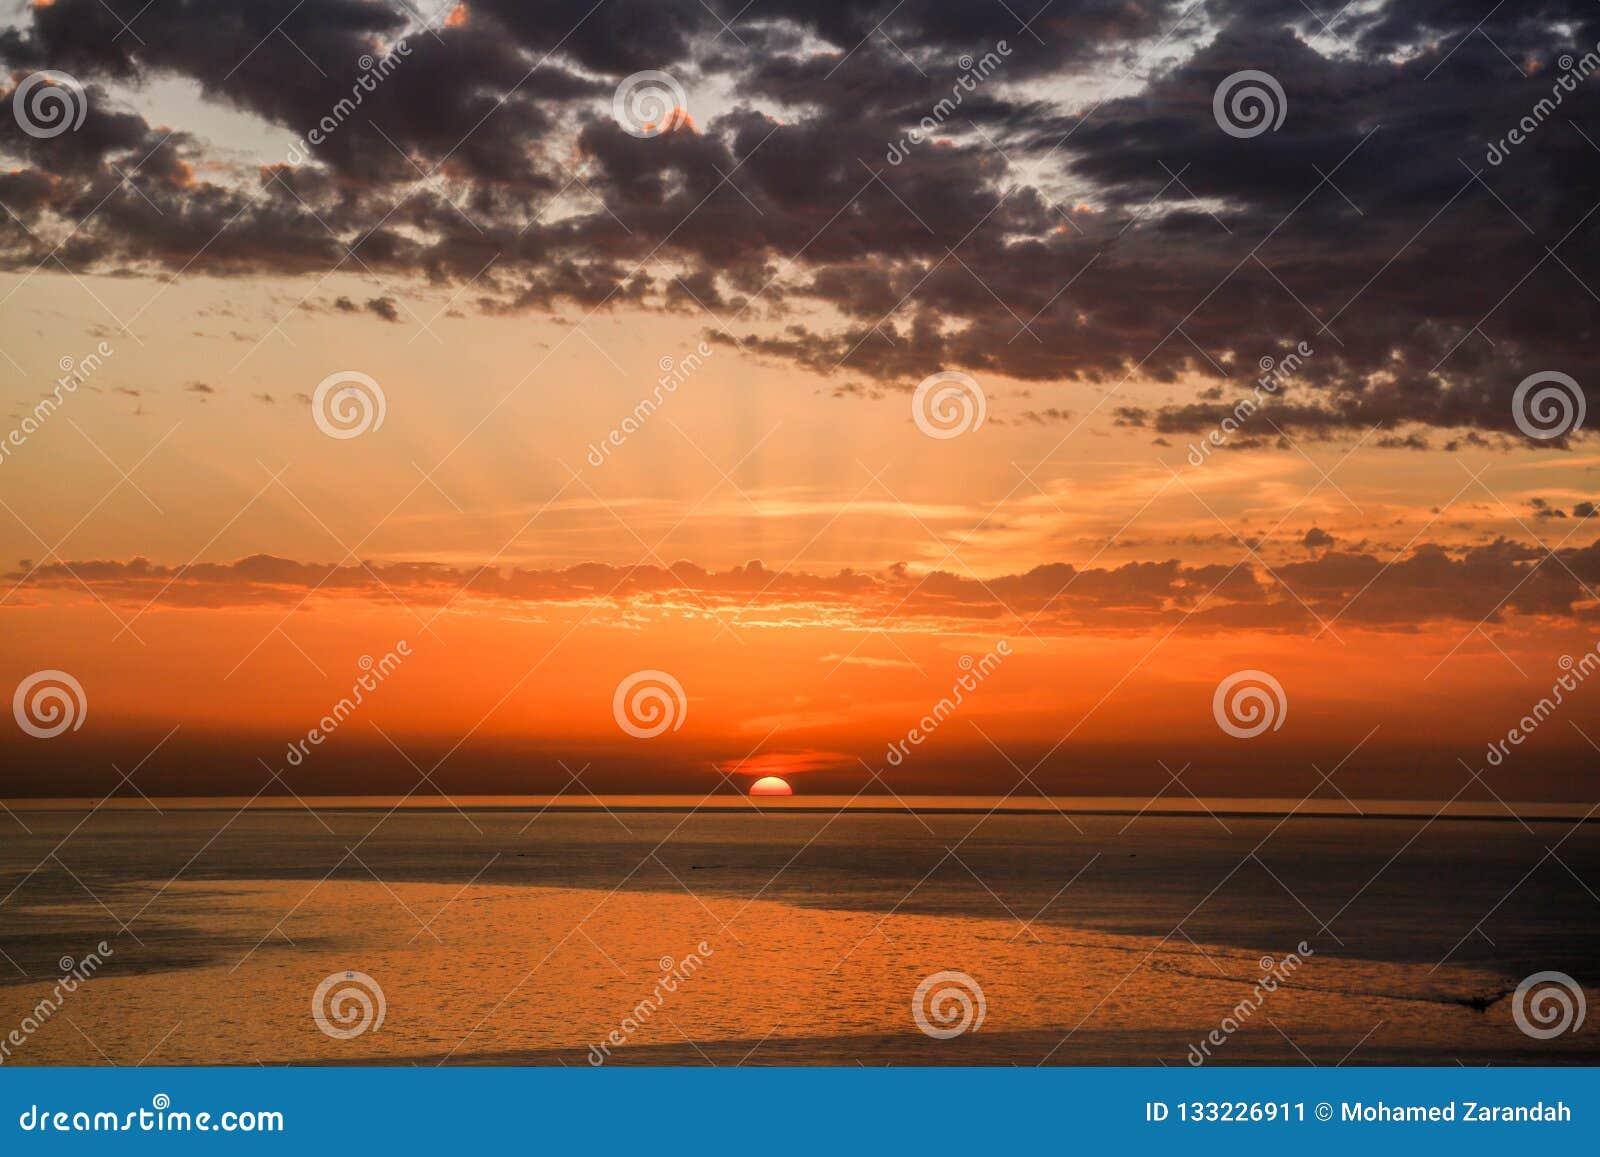 Золотой заход солнца на береге моря города Газа